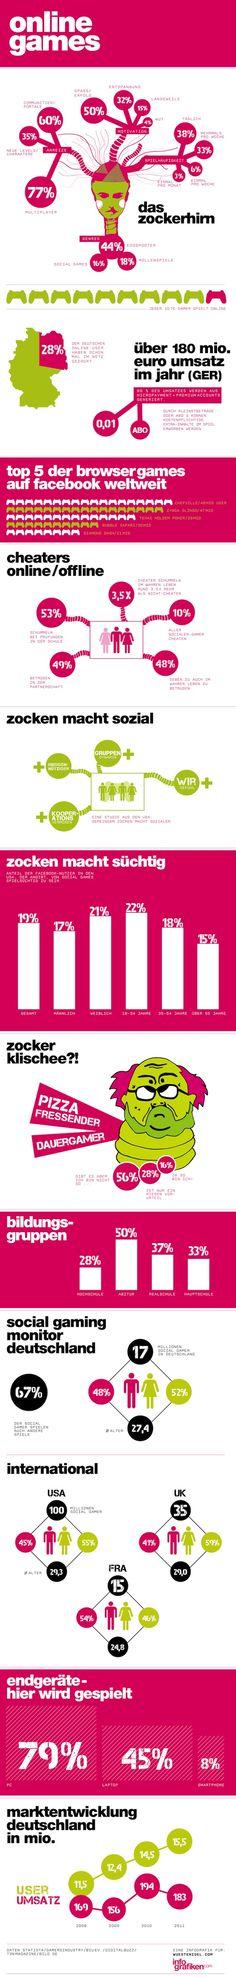 Browsergames #infografik Charts And Graphs, Online Games, Web Design, Geek Stuff, Infographics, Digital, Geeks, Gaming, Internet